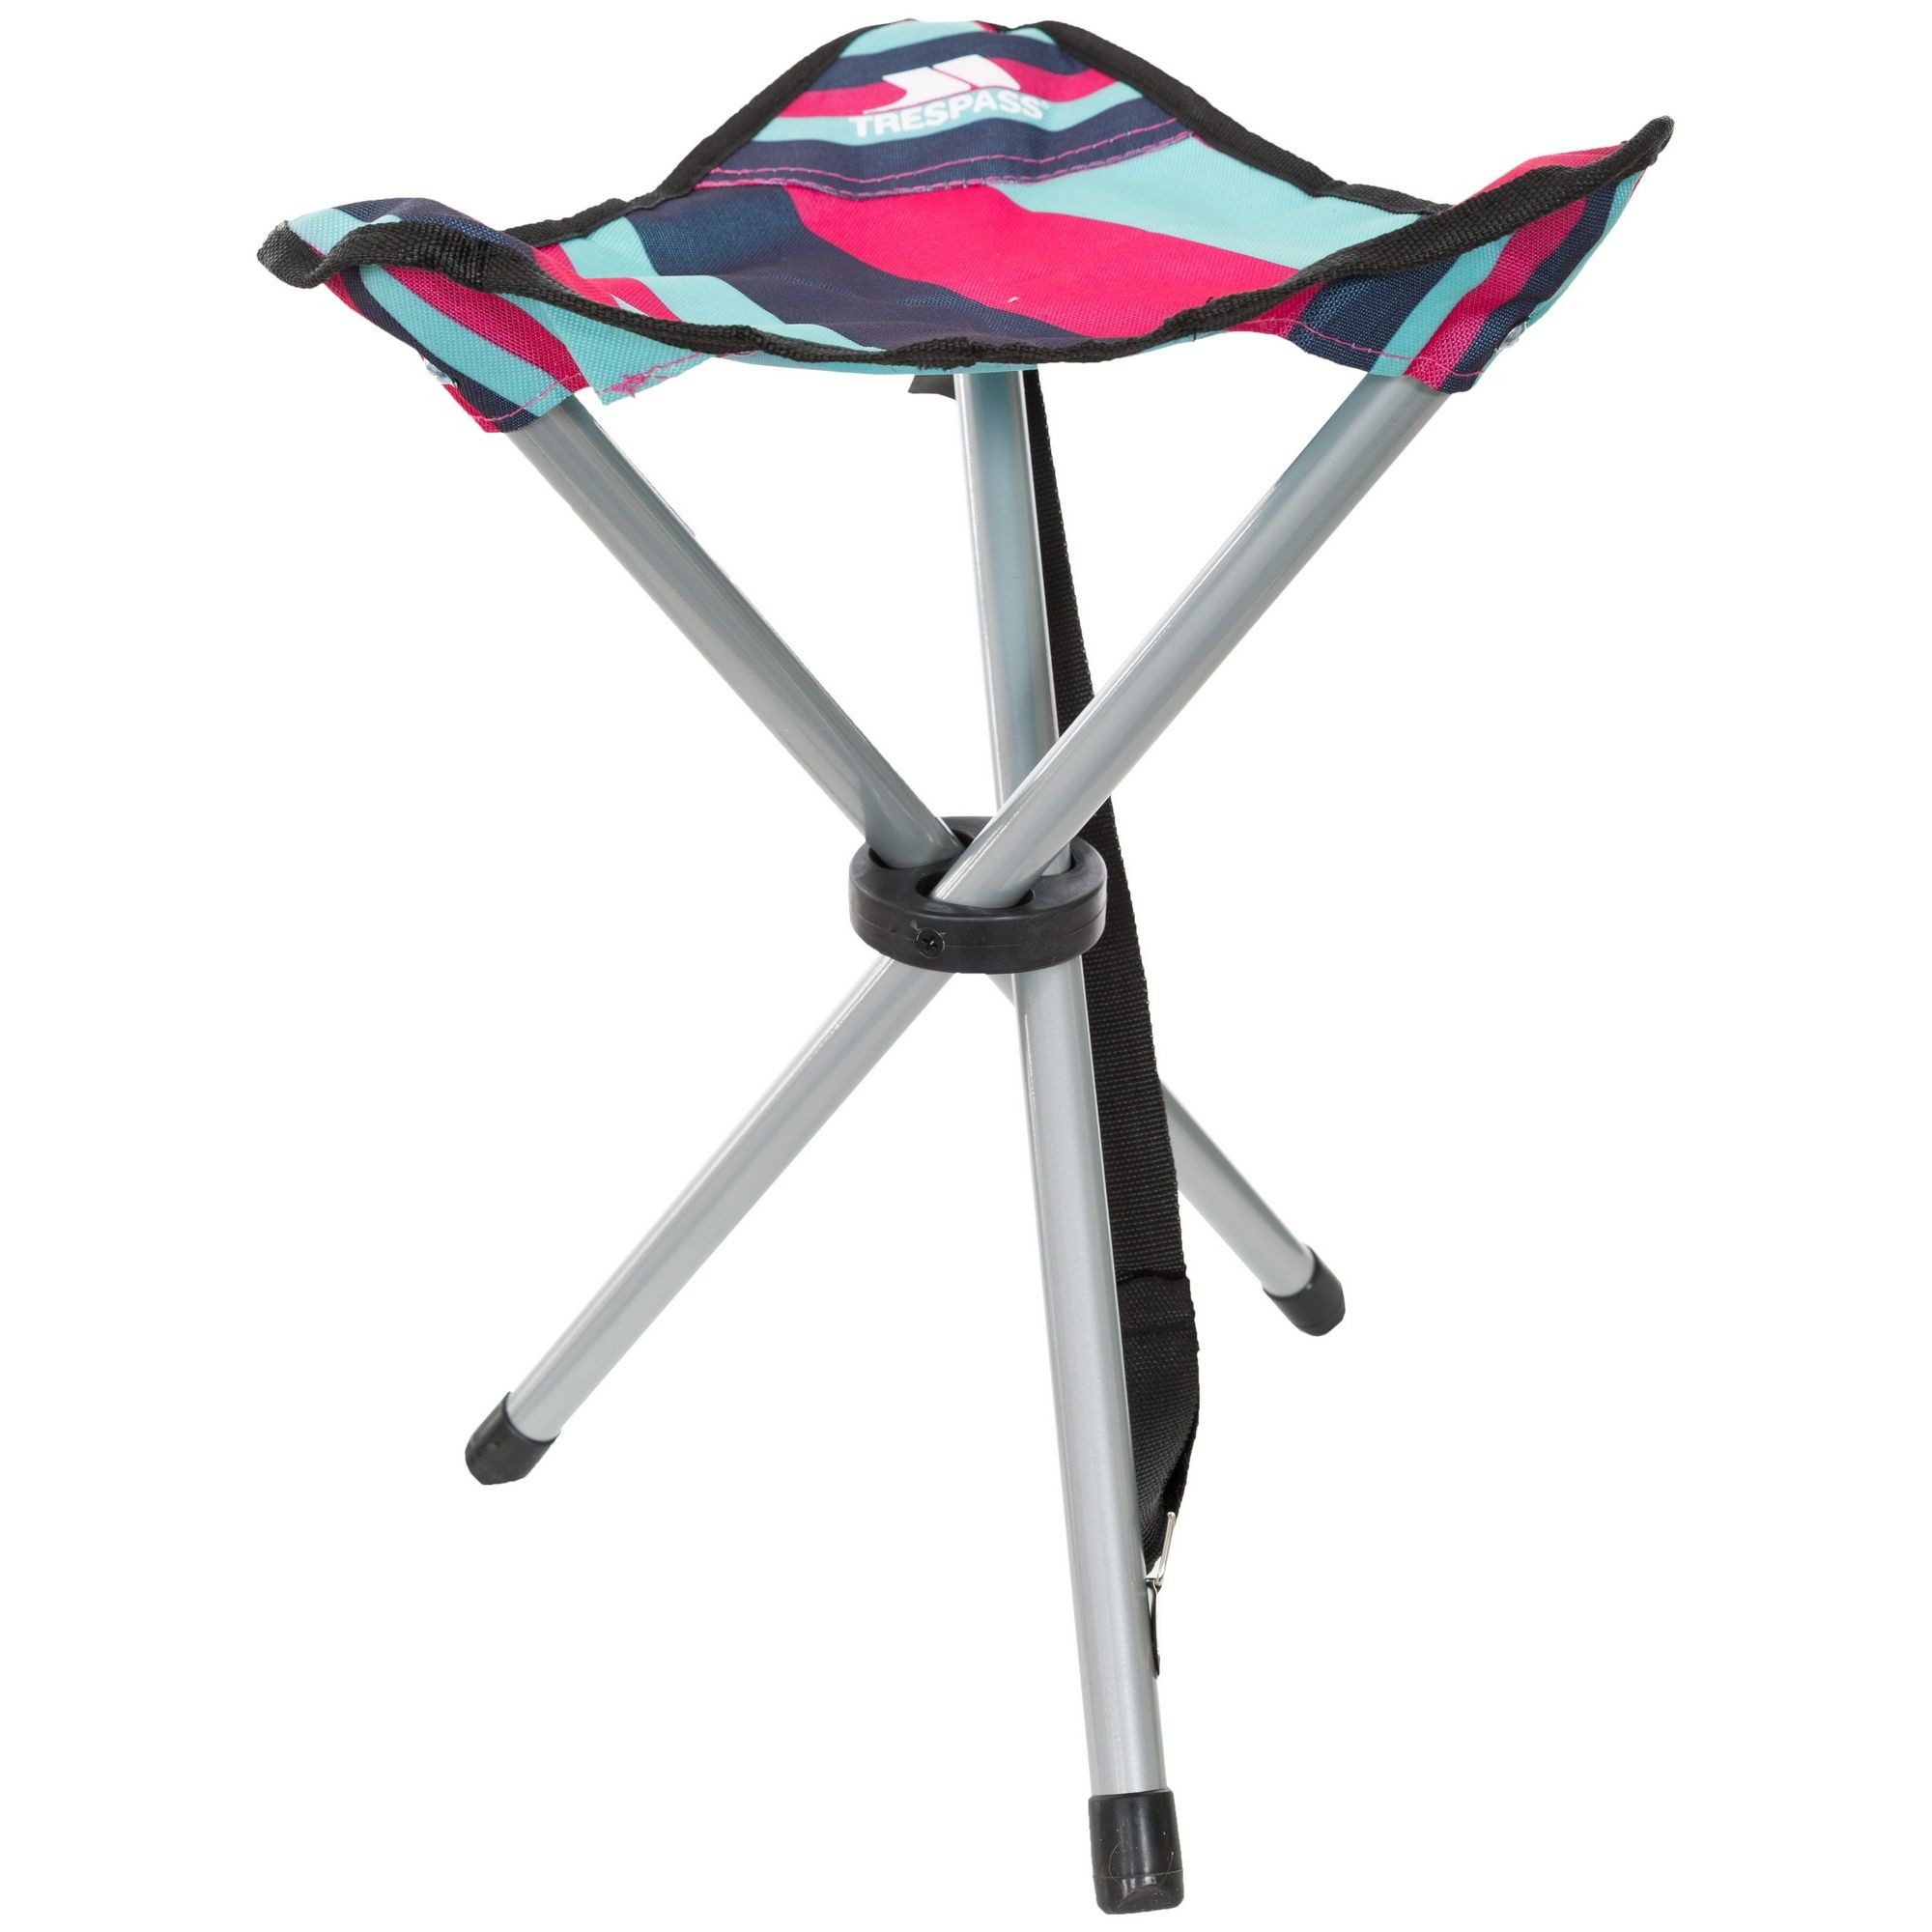 Trespass Ritchie Tripod Camping Stool/Chair